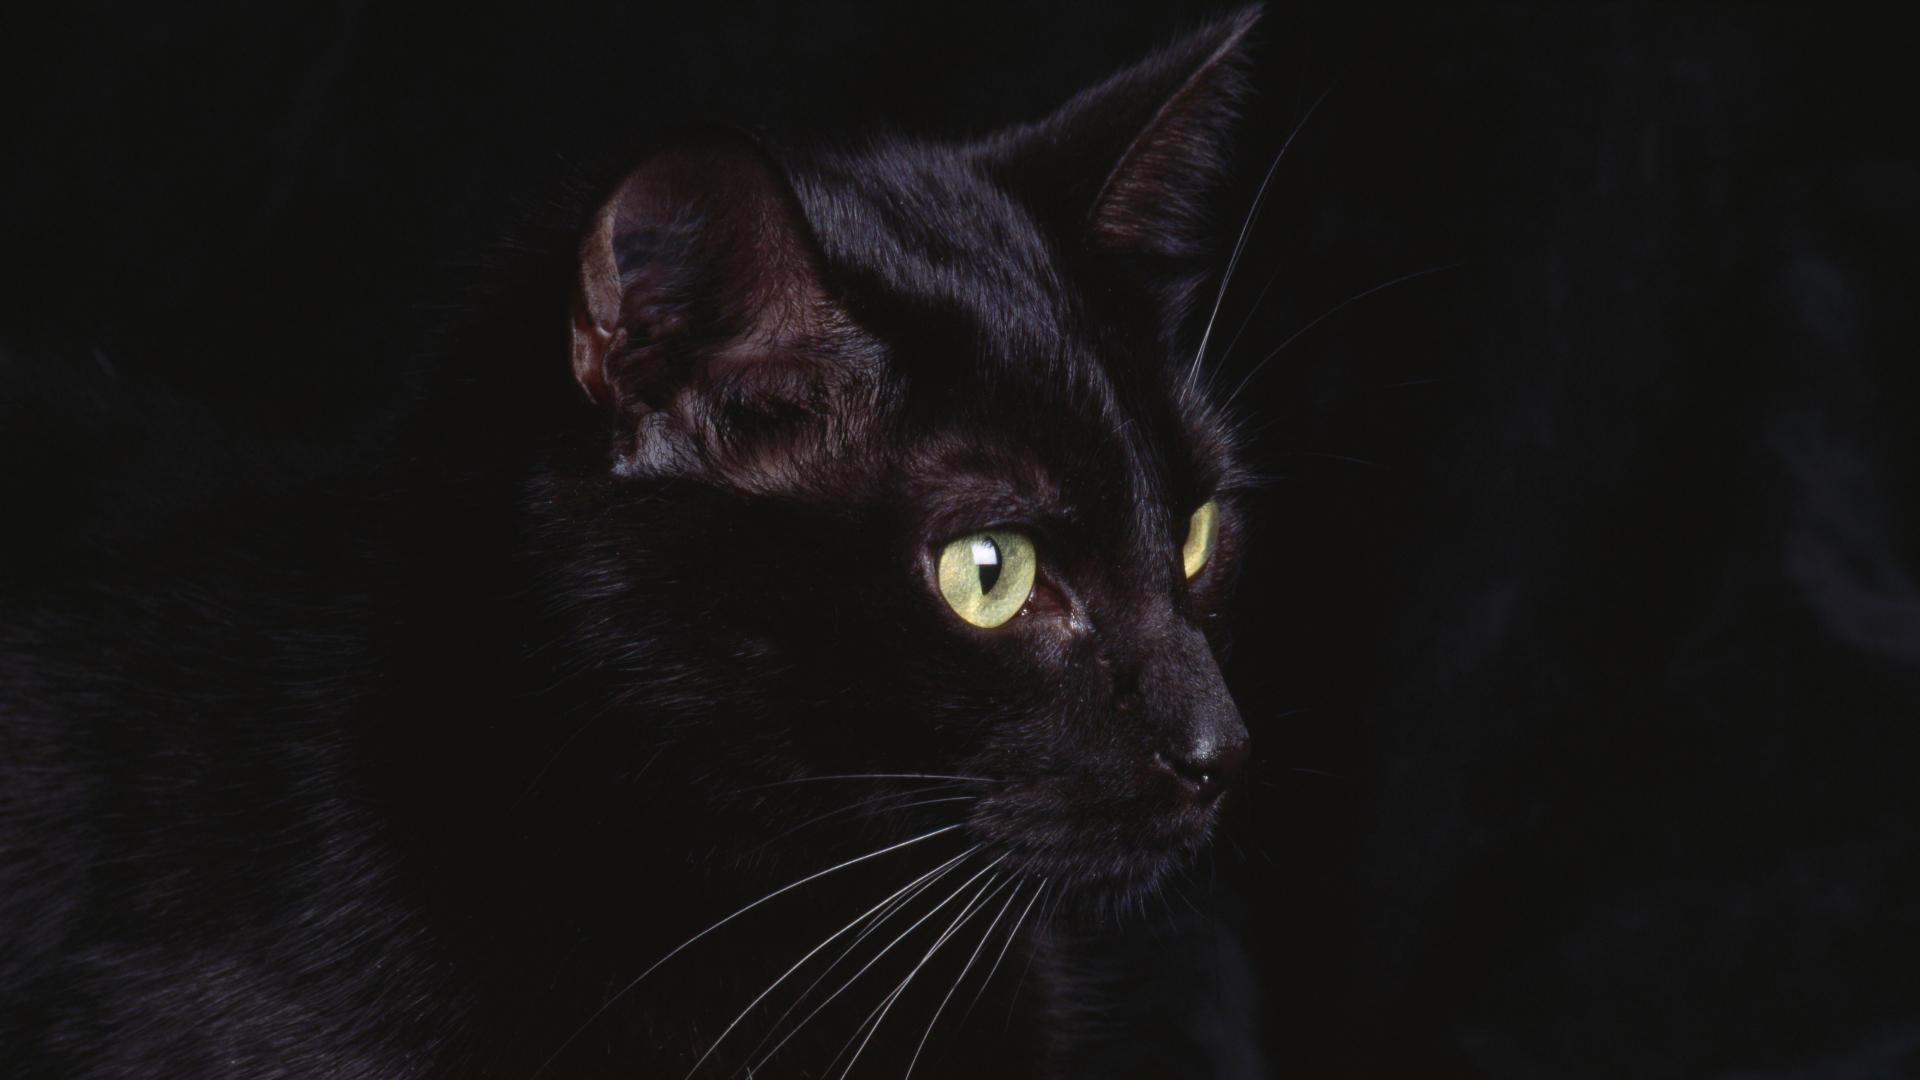 Black-Cat-Animal-Download-High-wallpaper-wp3603388